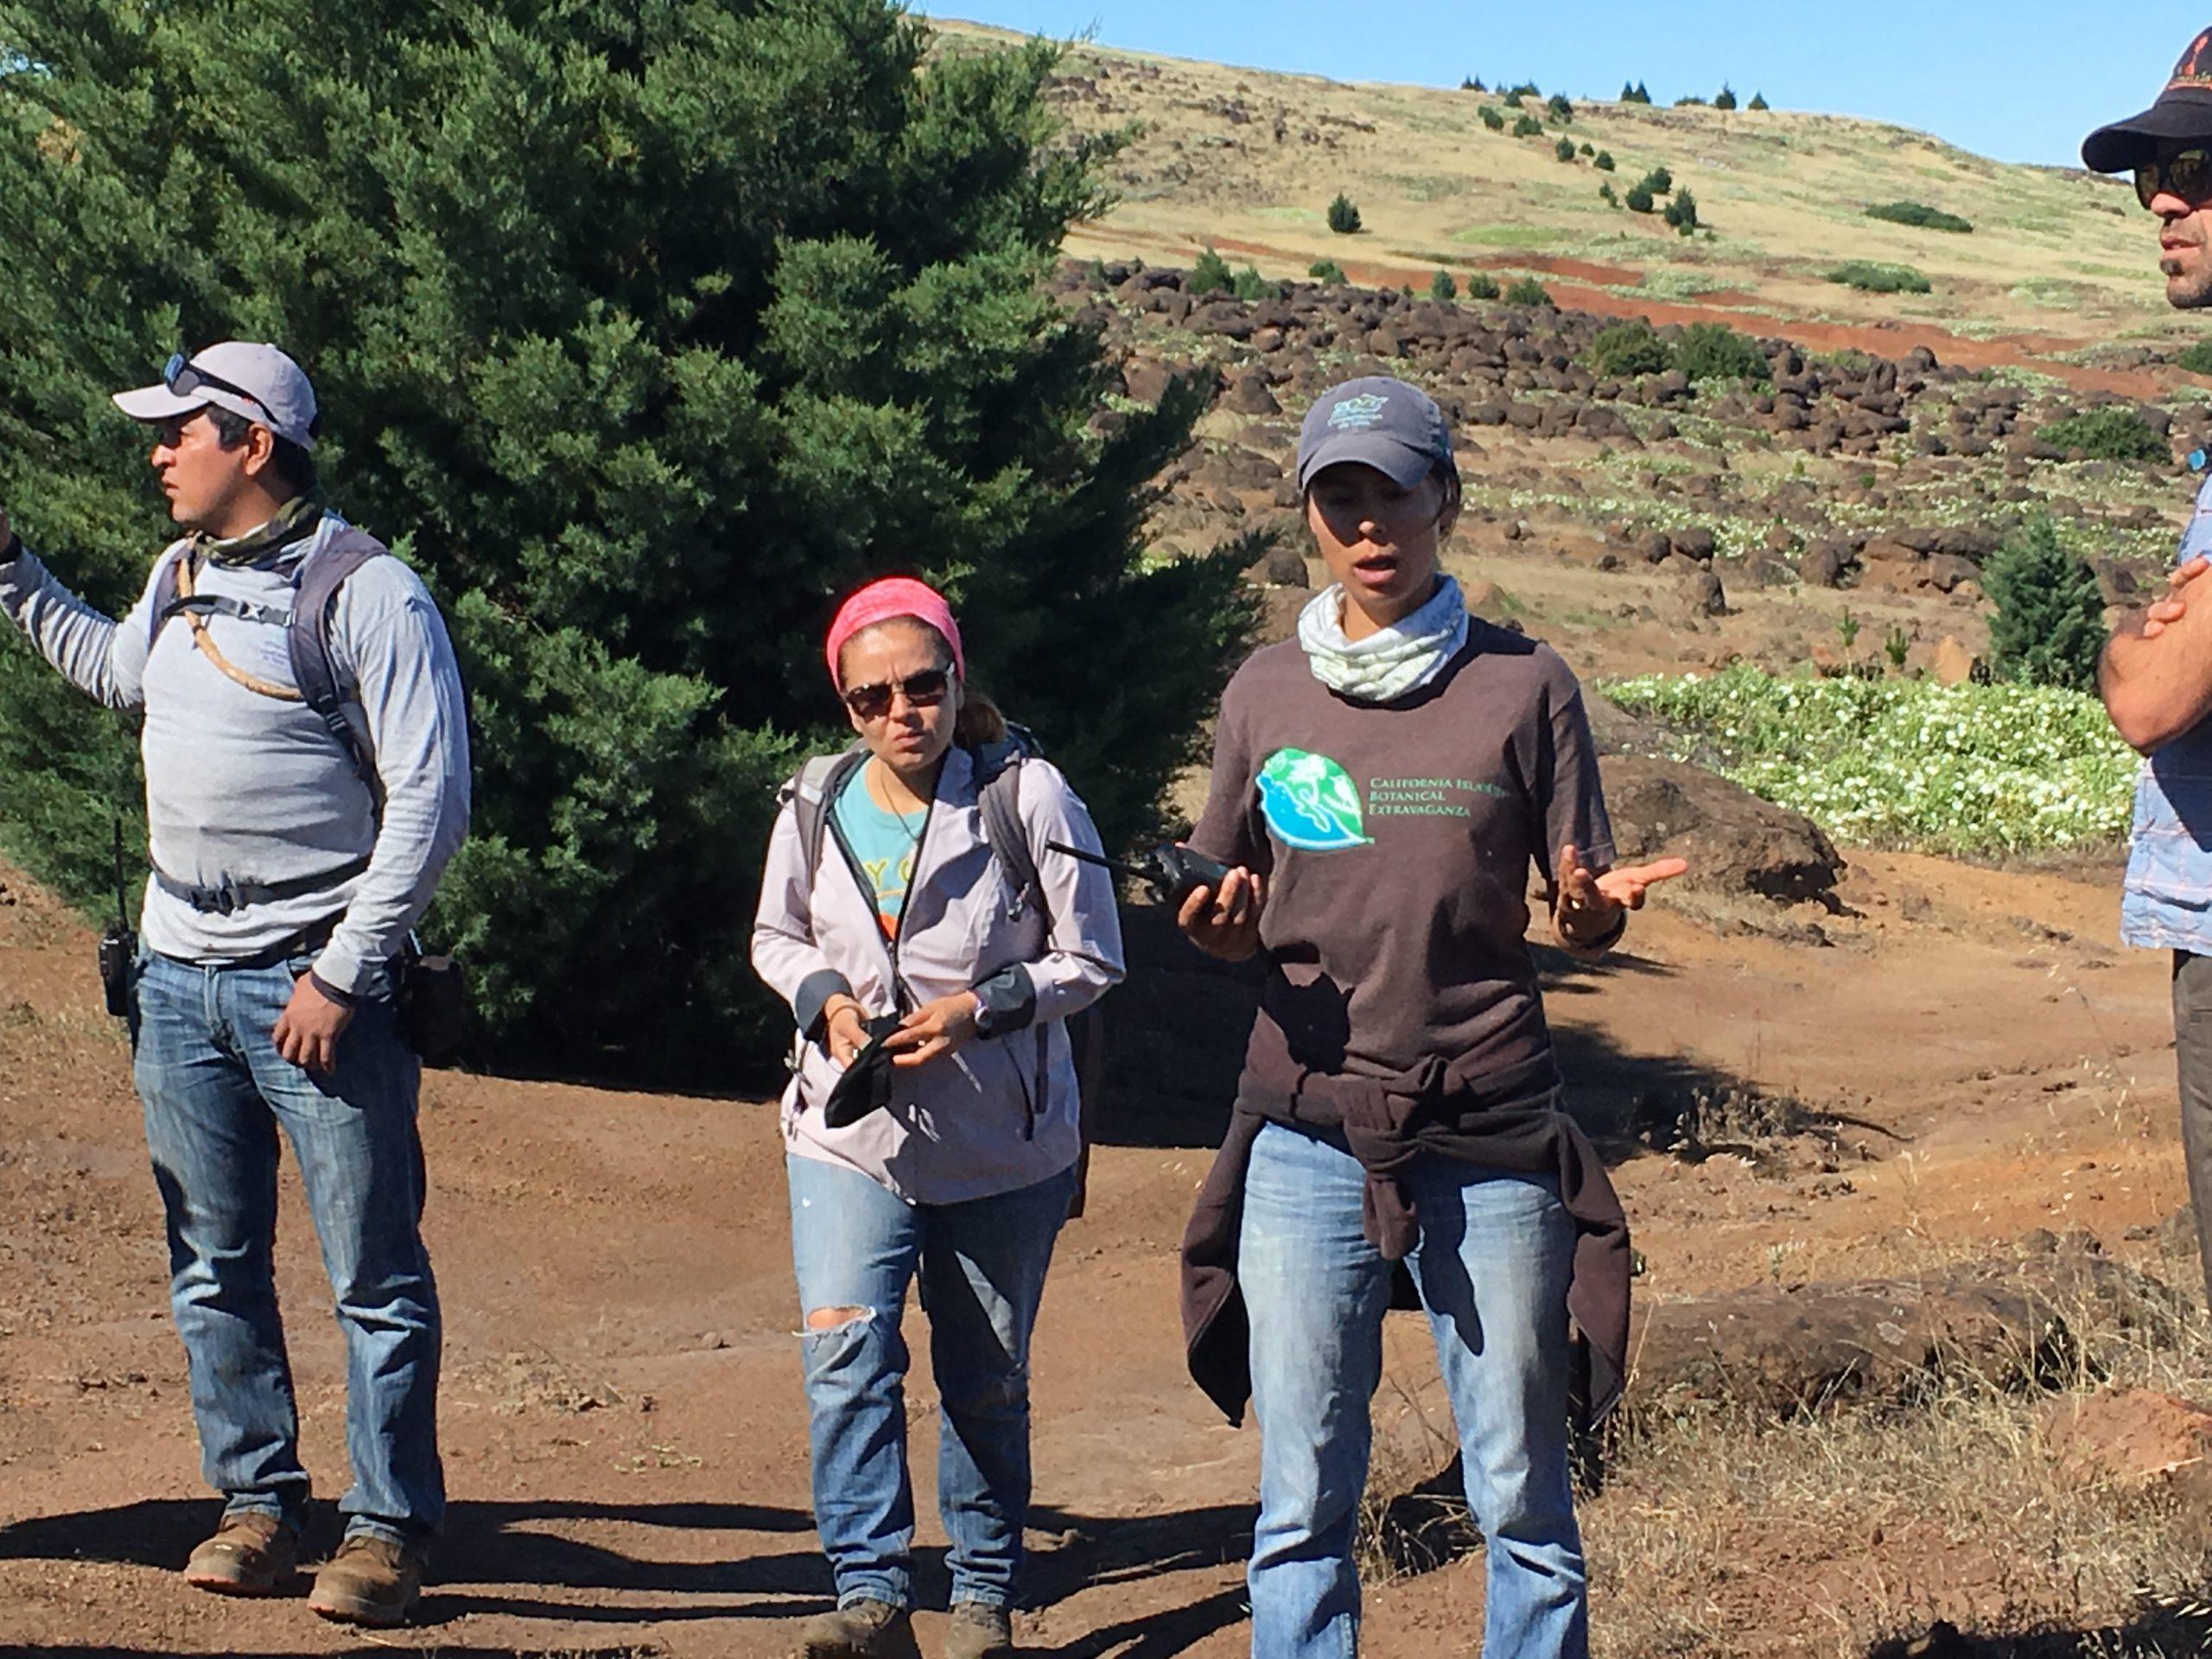 Dr. Luciana Luna Mendoza, Directora de Ecologia, Grupo de Ecologia y Conservacion de Islas, explains the restoration work.